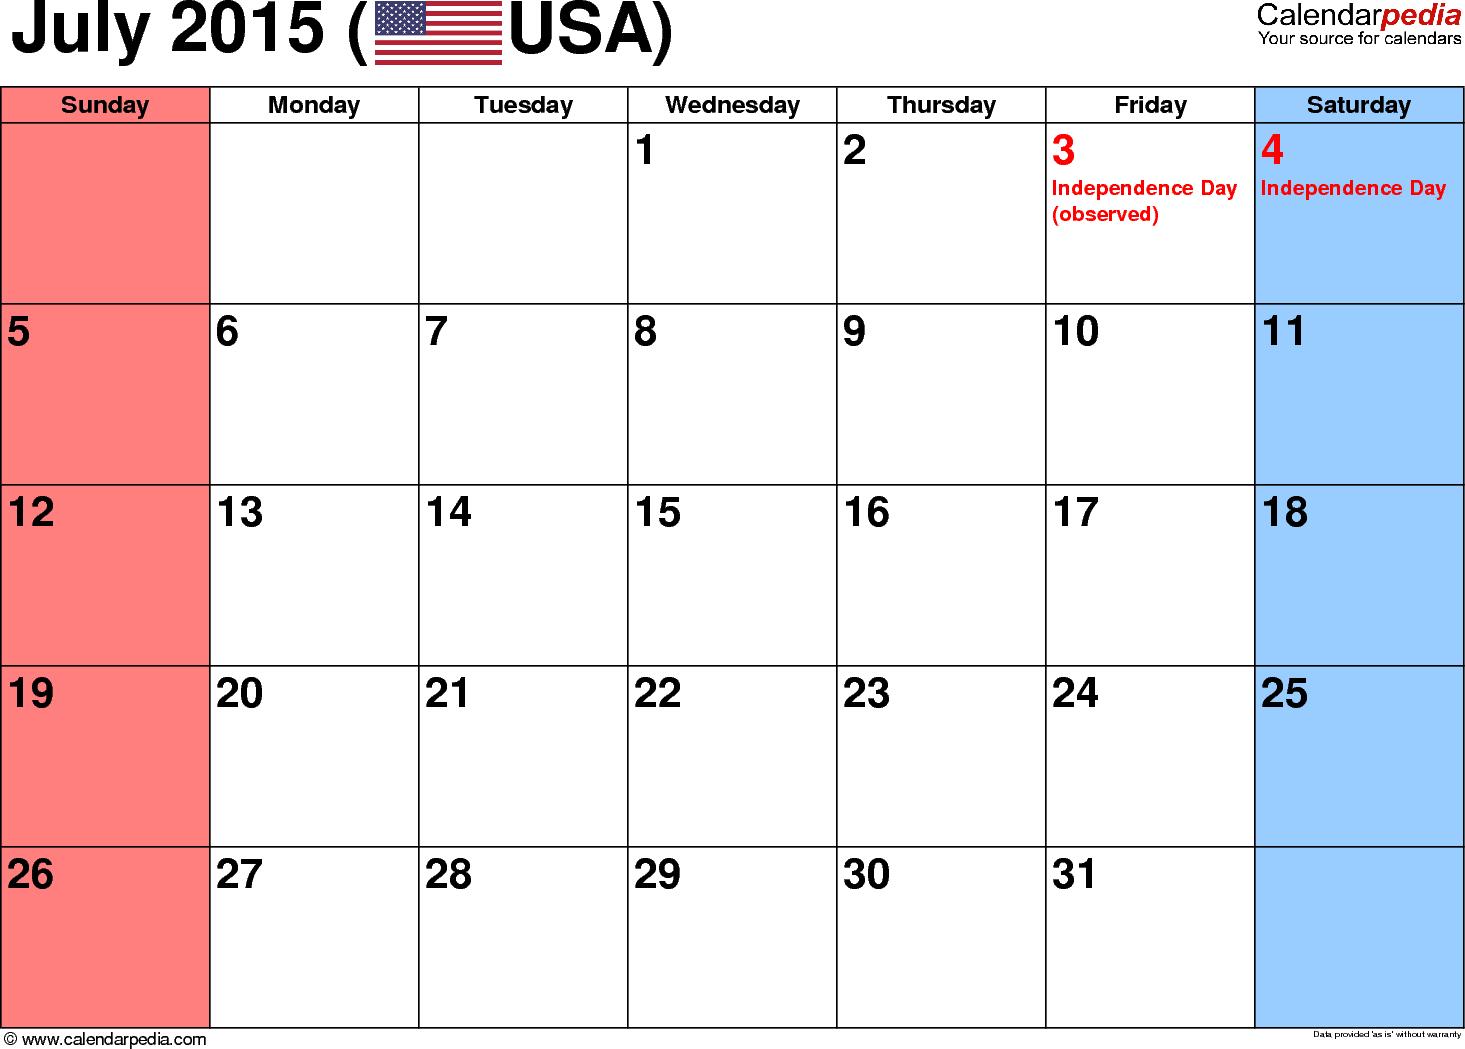 July 2015 Calendar Free Templates For Word Excel Pdf September Calendar January 2018 Calendar Printable July Calendar